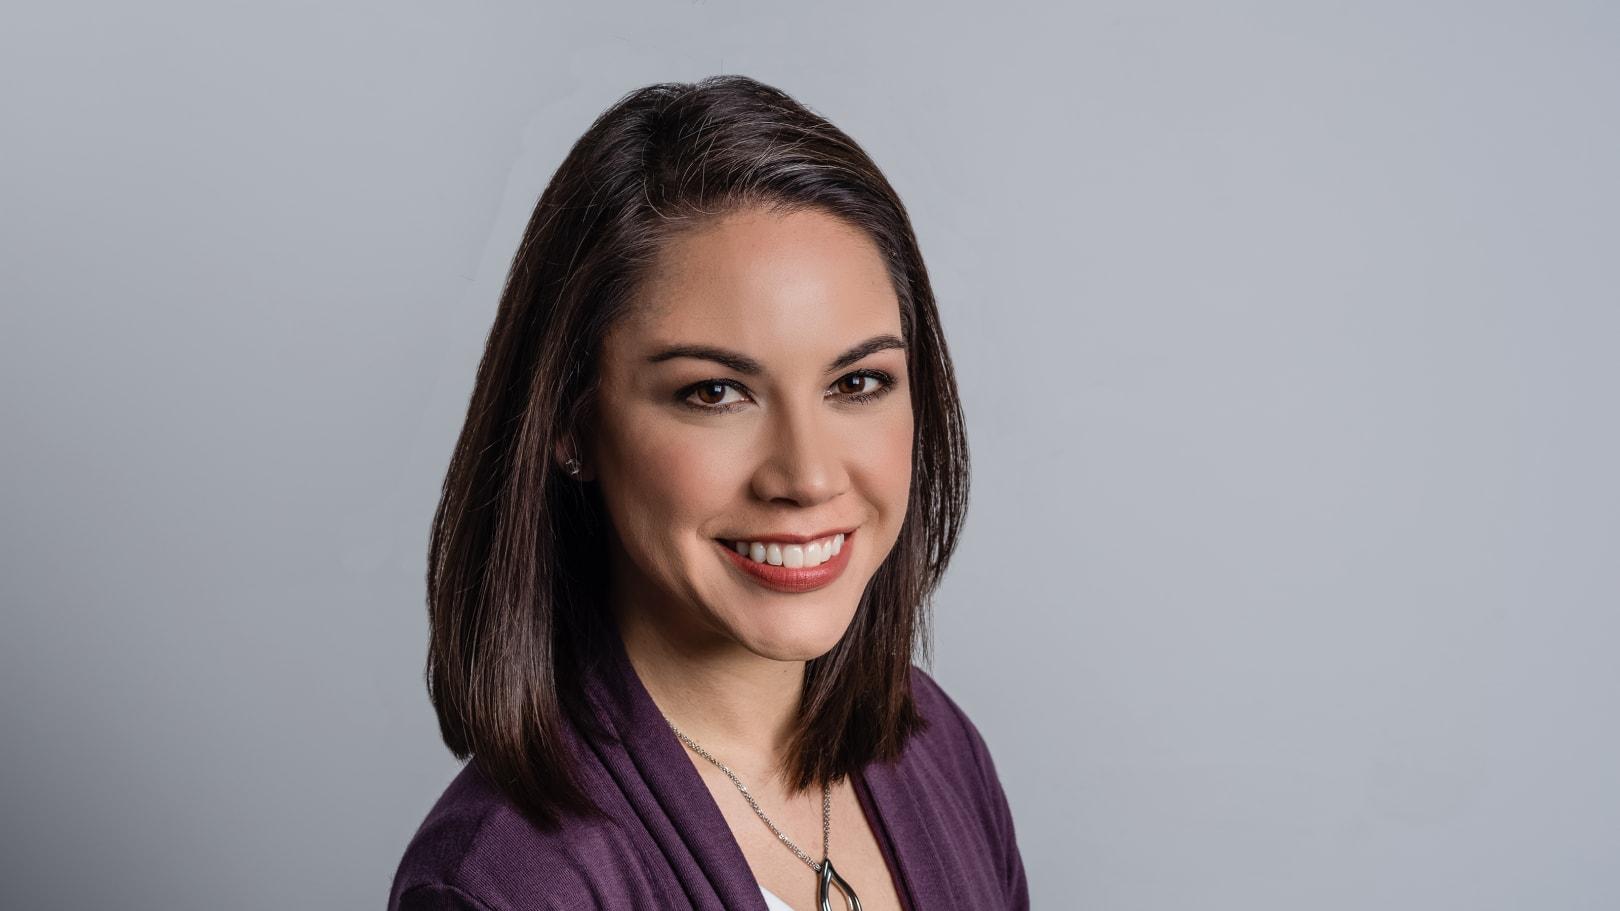 Michelle Acosta